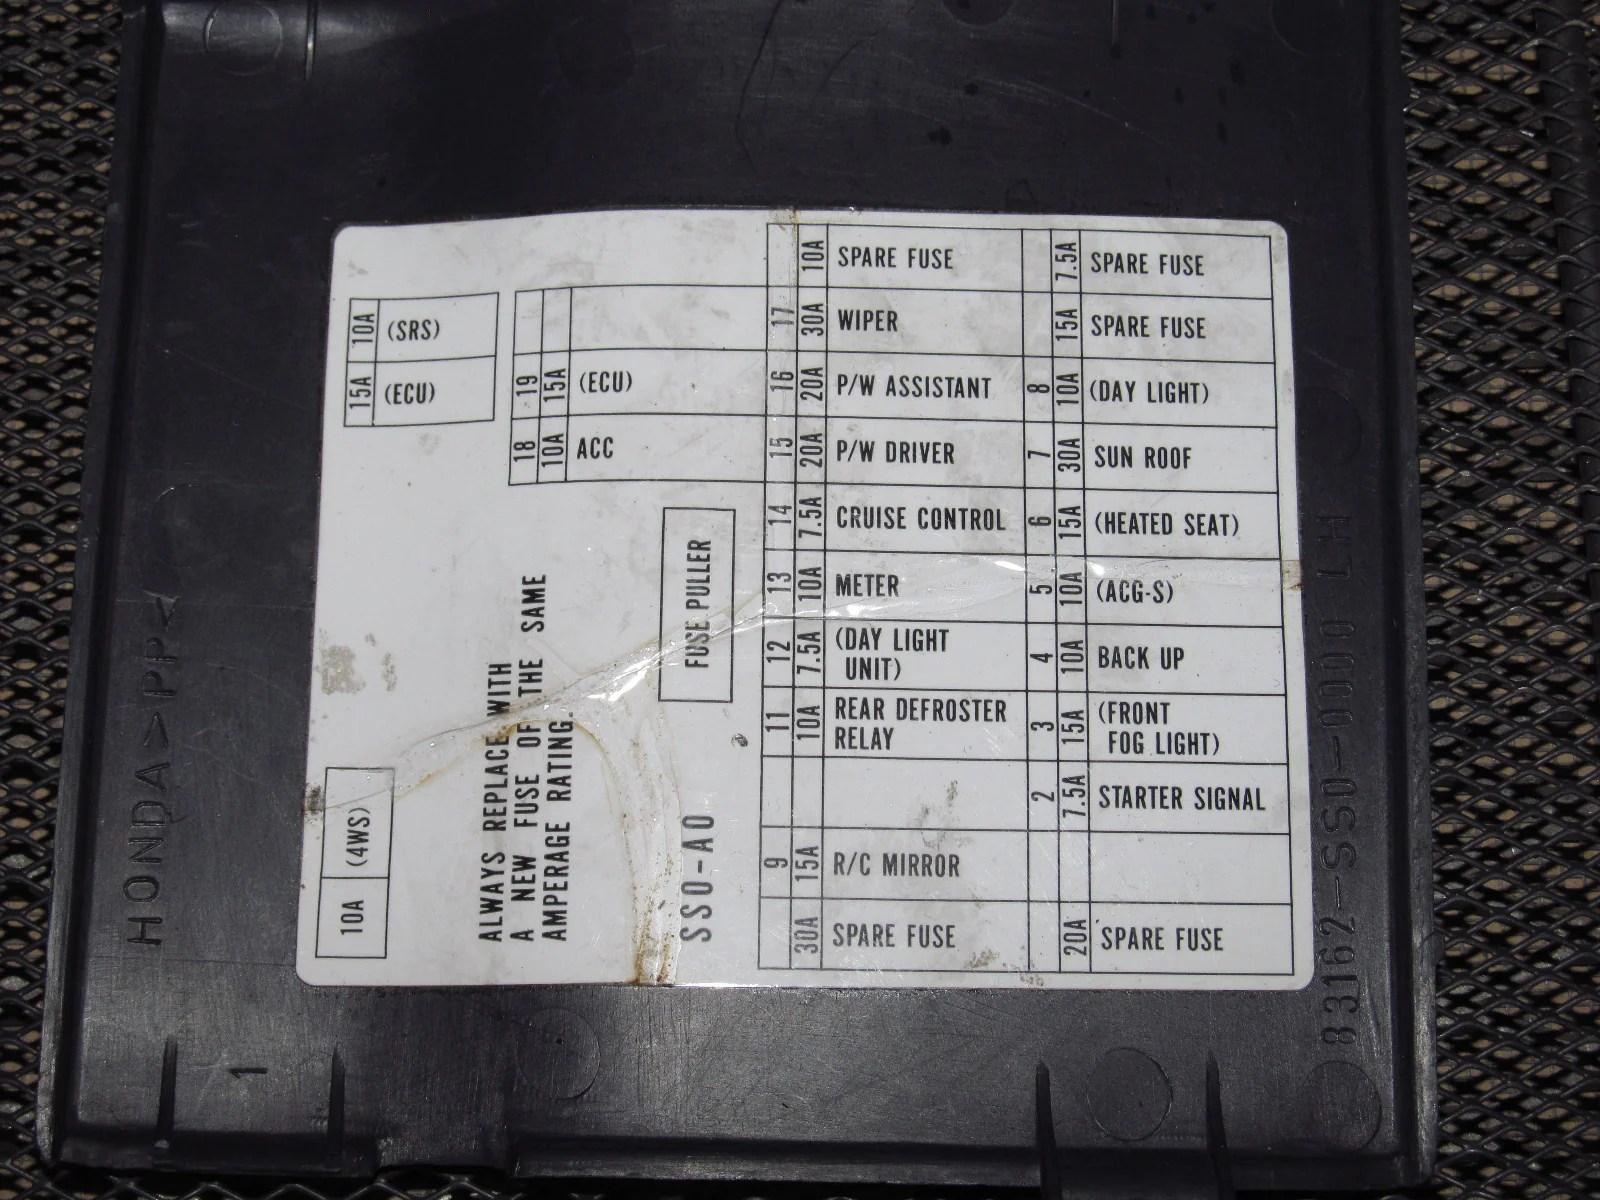 92 93 94 95 96 honda prelude oem interior fuse box cover [ 1600 x 1200 Pixel ]